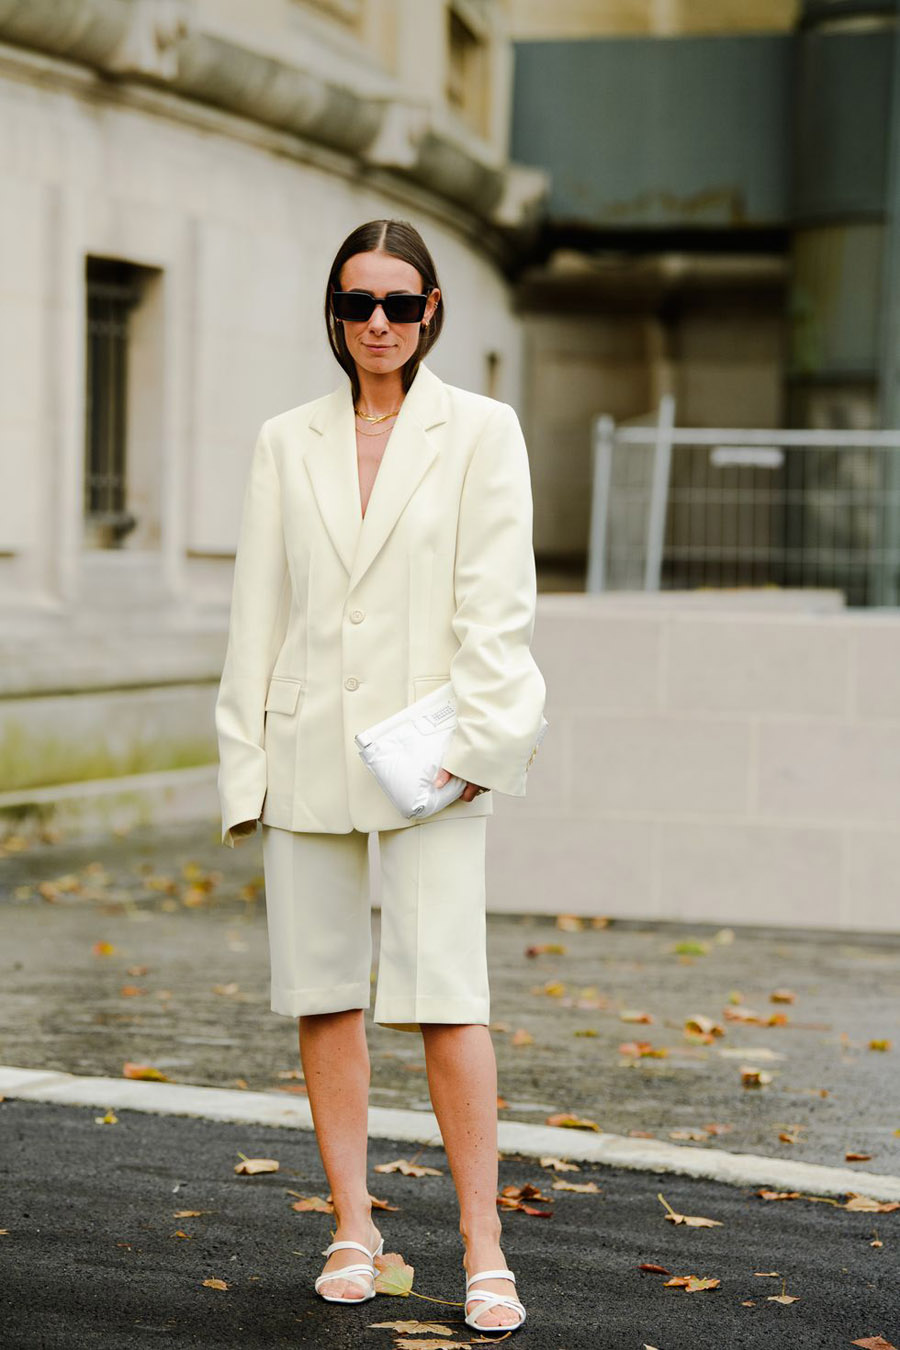 paris-fashion-week-pfw-street-style-ss20-day-2-by-tyler-joe-135-1569745066